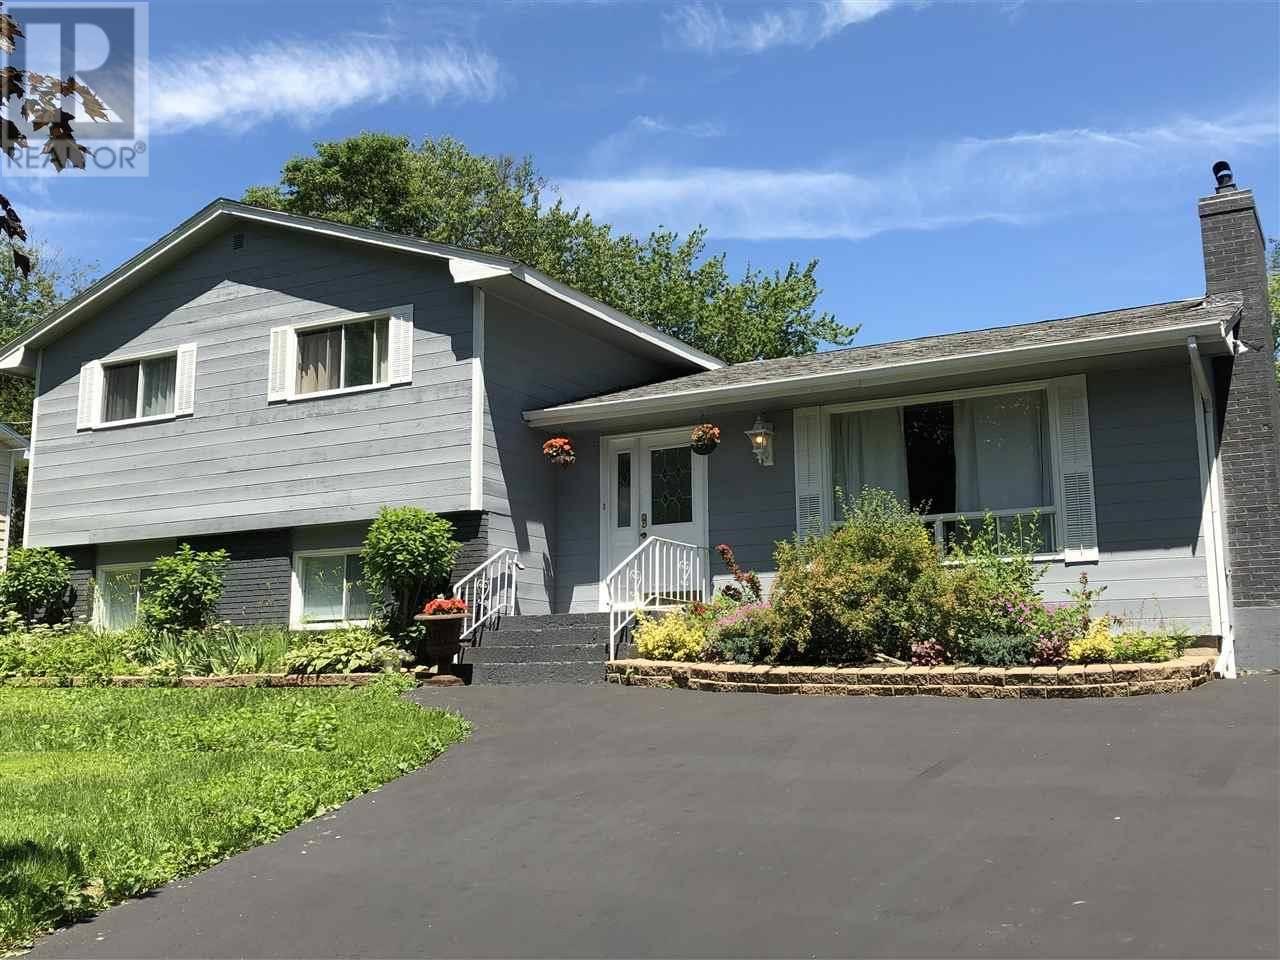 House for sale at 30 Overbrook Dr Waverley Nova Scotia - MLS: 201913153